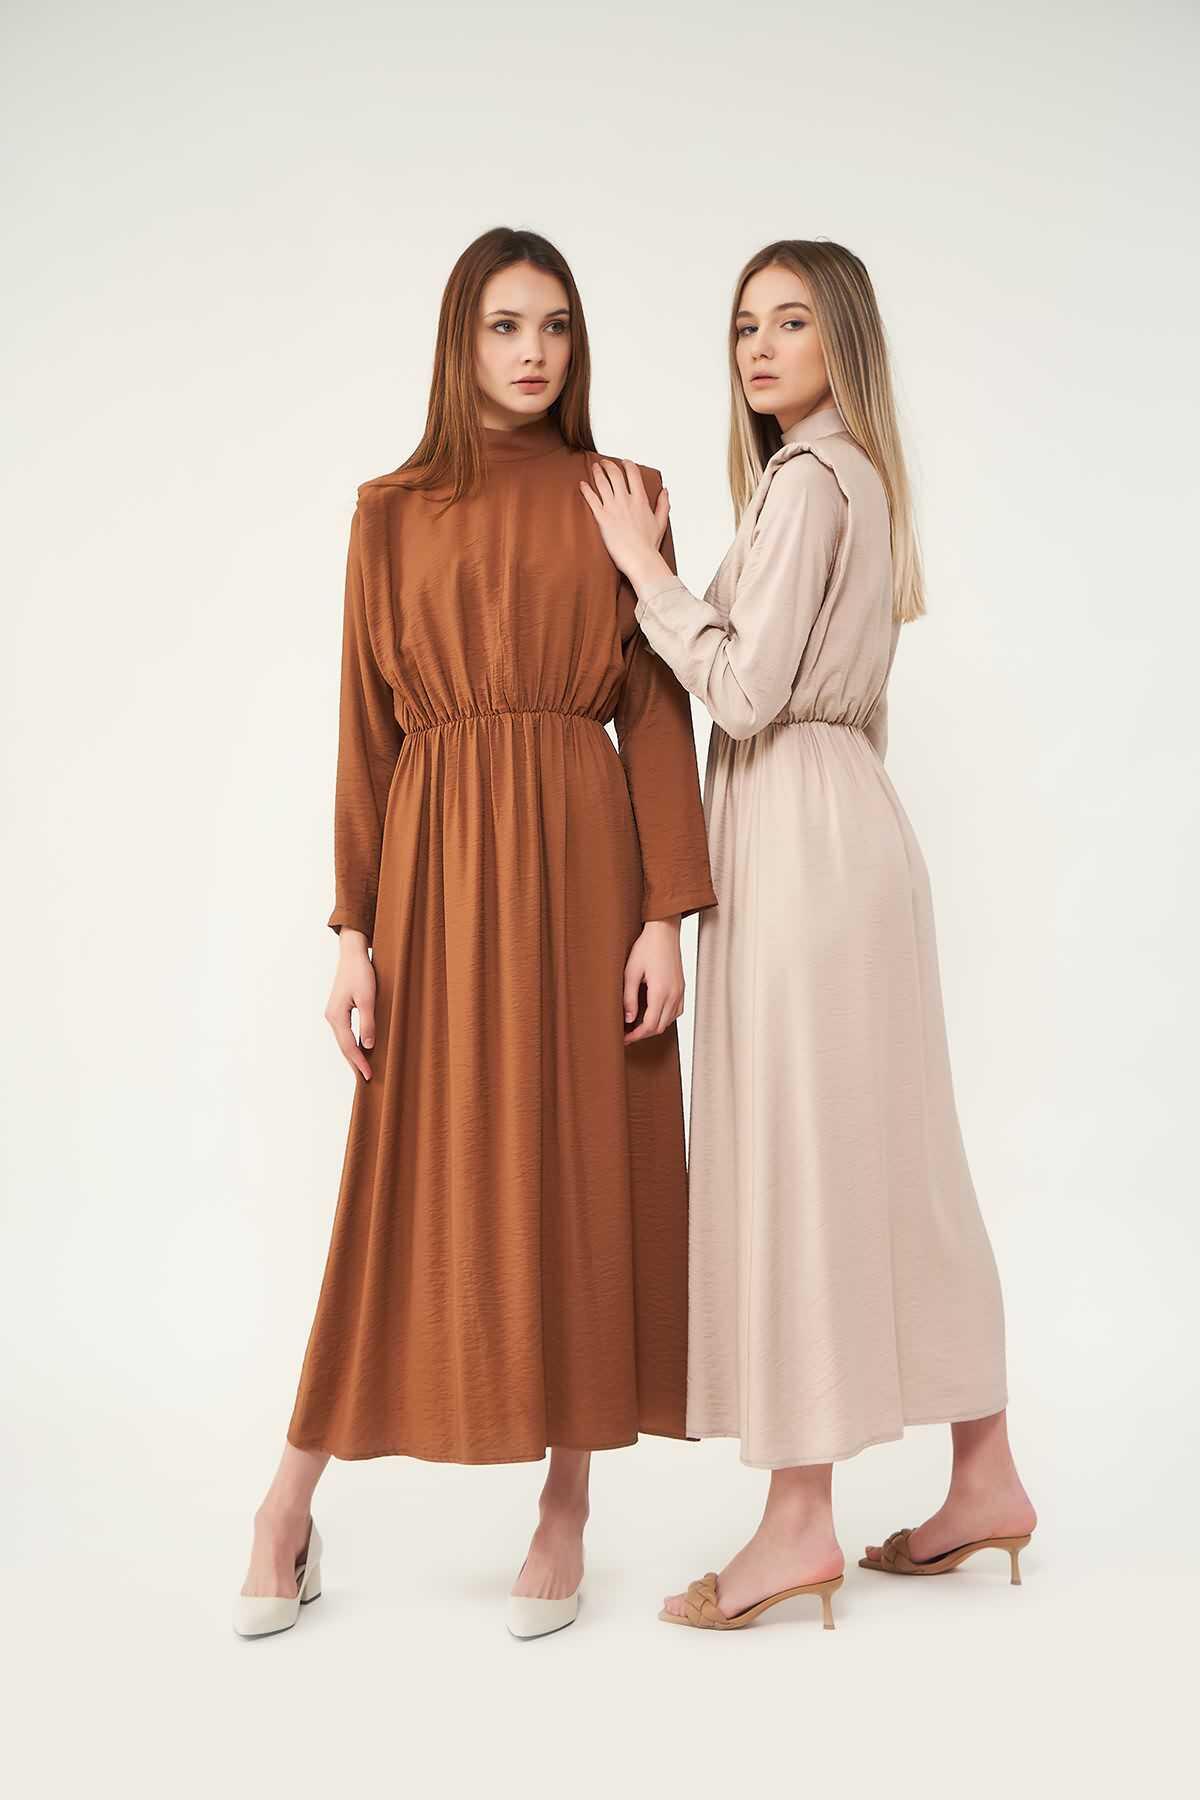 Mevra - Vatkalı Elbise Bej